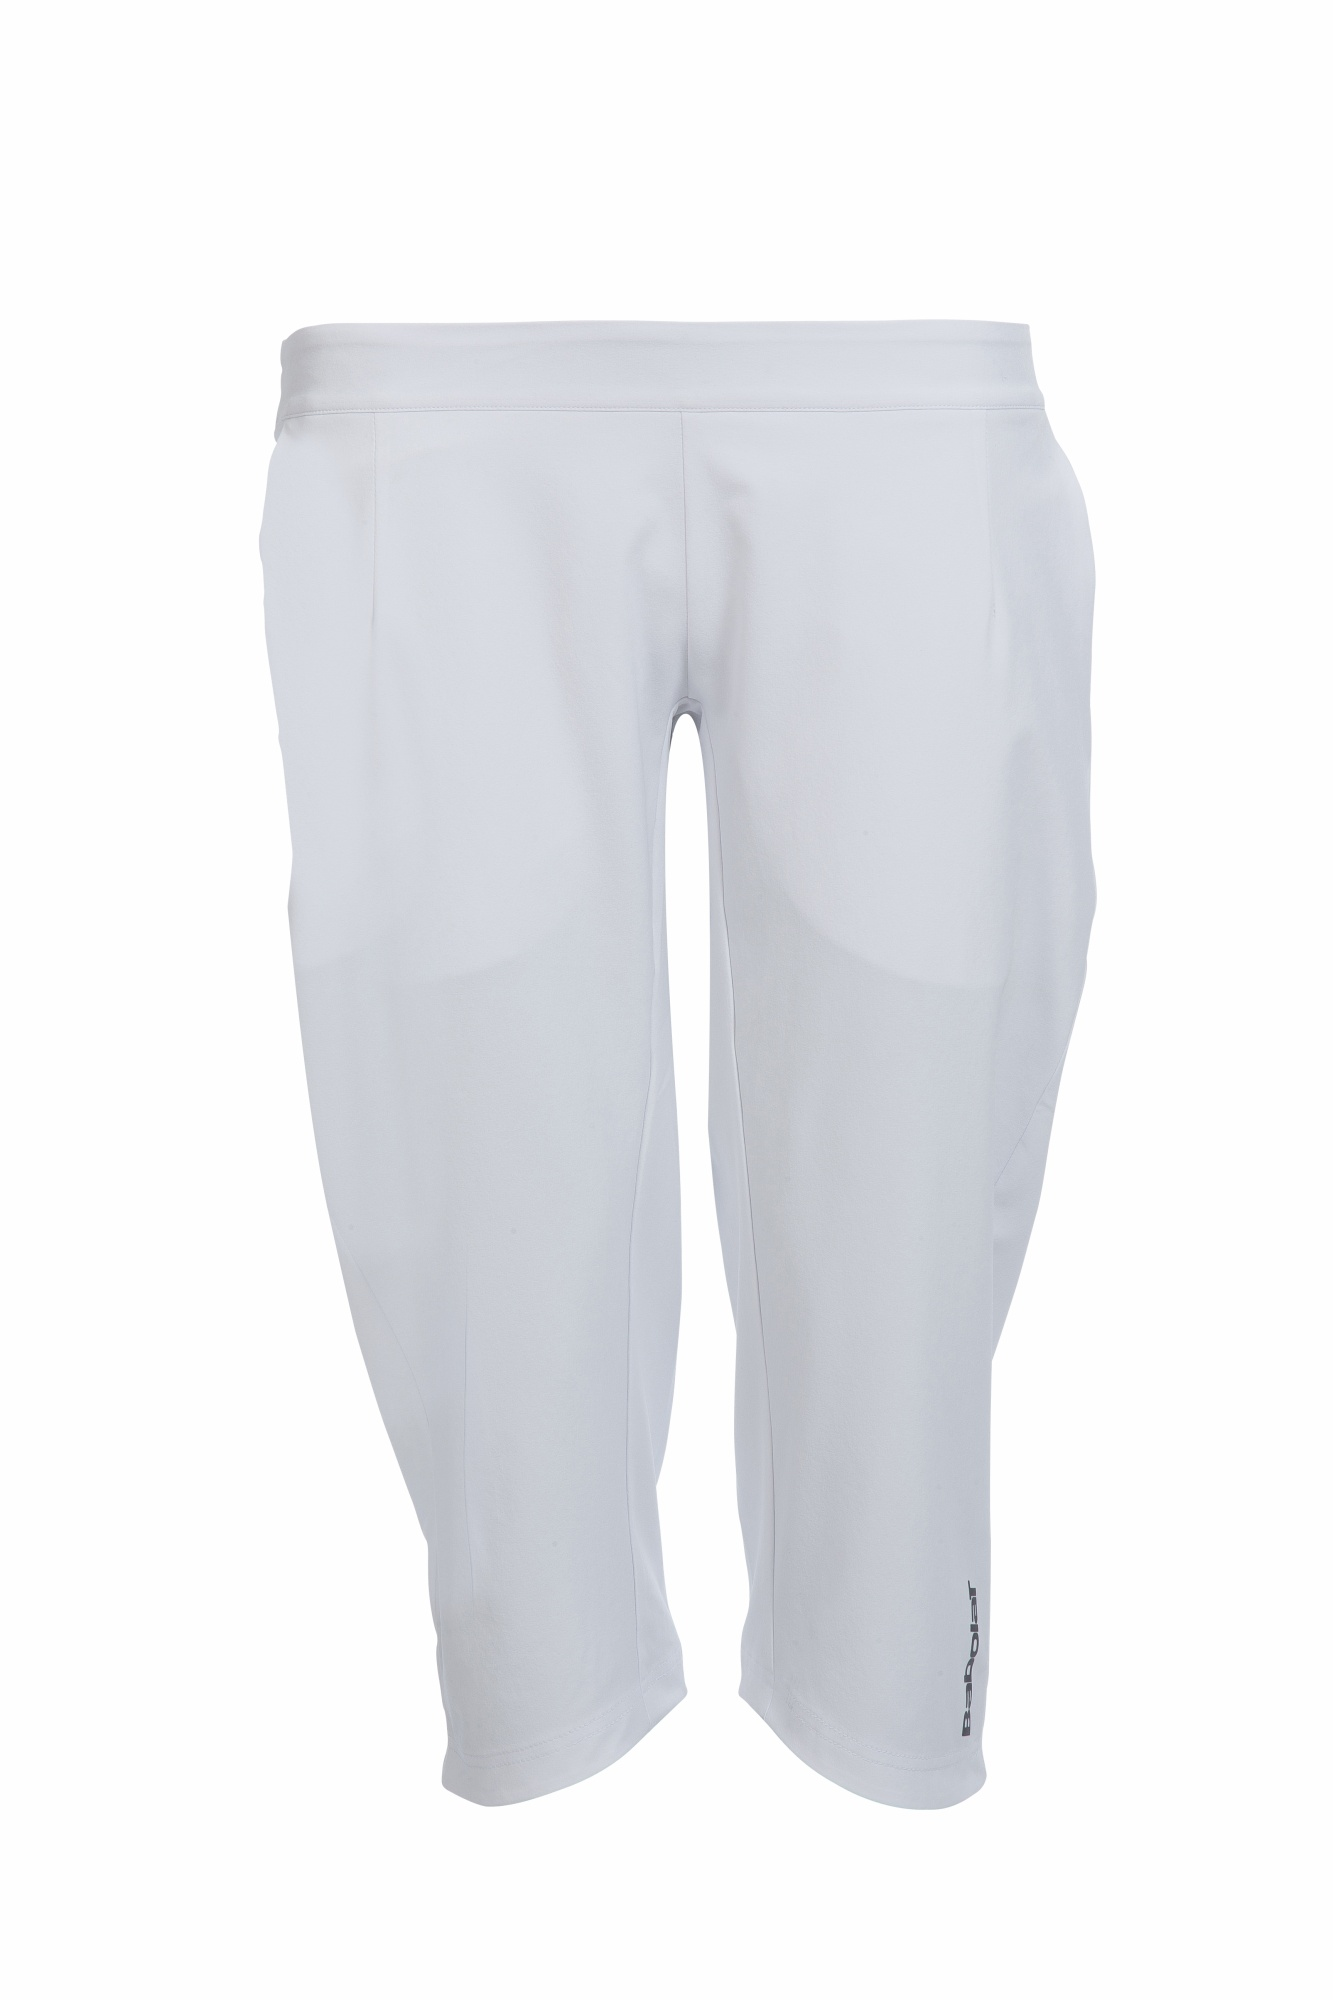 Babolat 3/4 Pant Women Match Performance White 2015 L